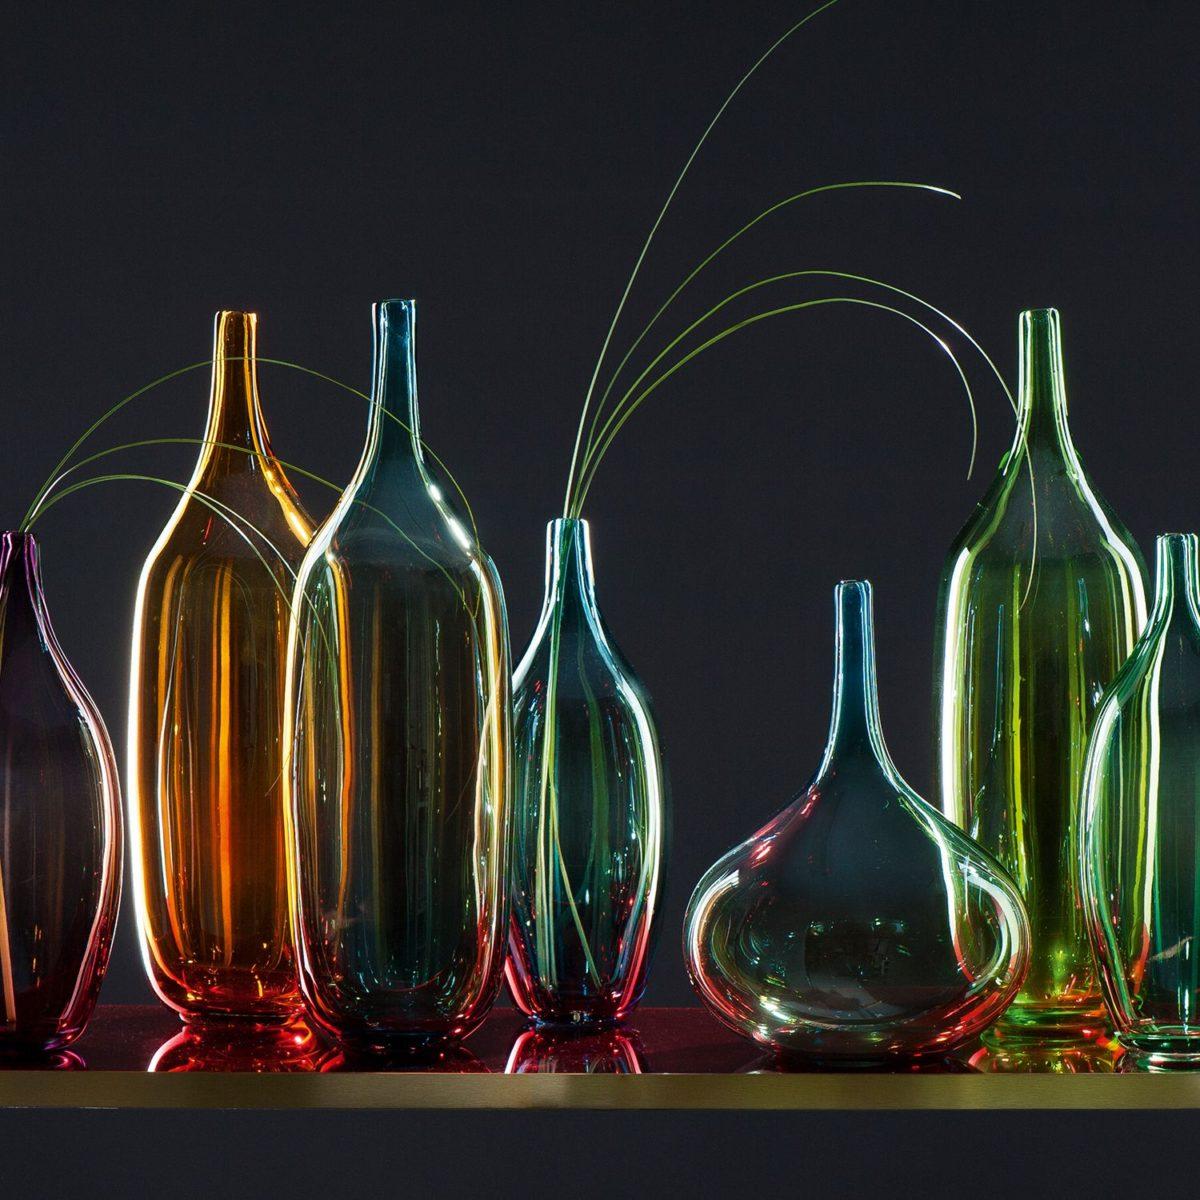 020822 1 k 1 1200x1200 - Vază luster Lucente turquoise 32 cm (L020815)